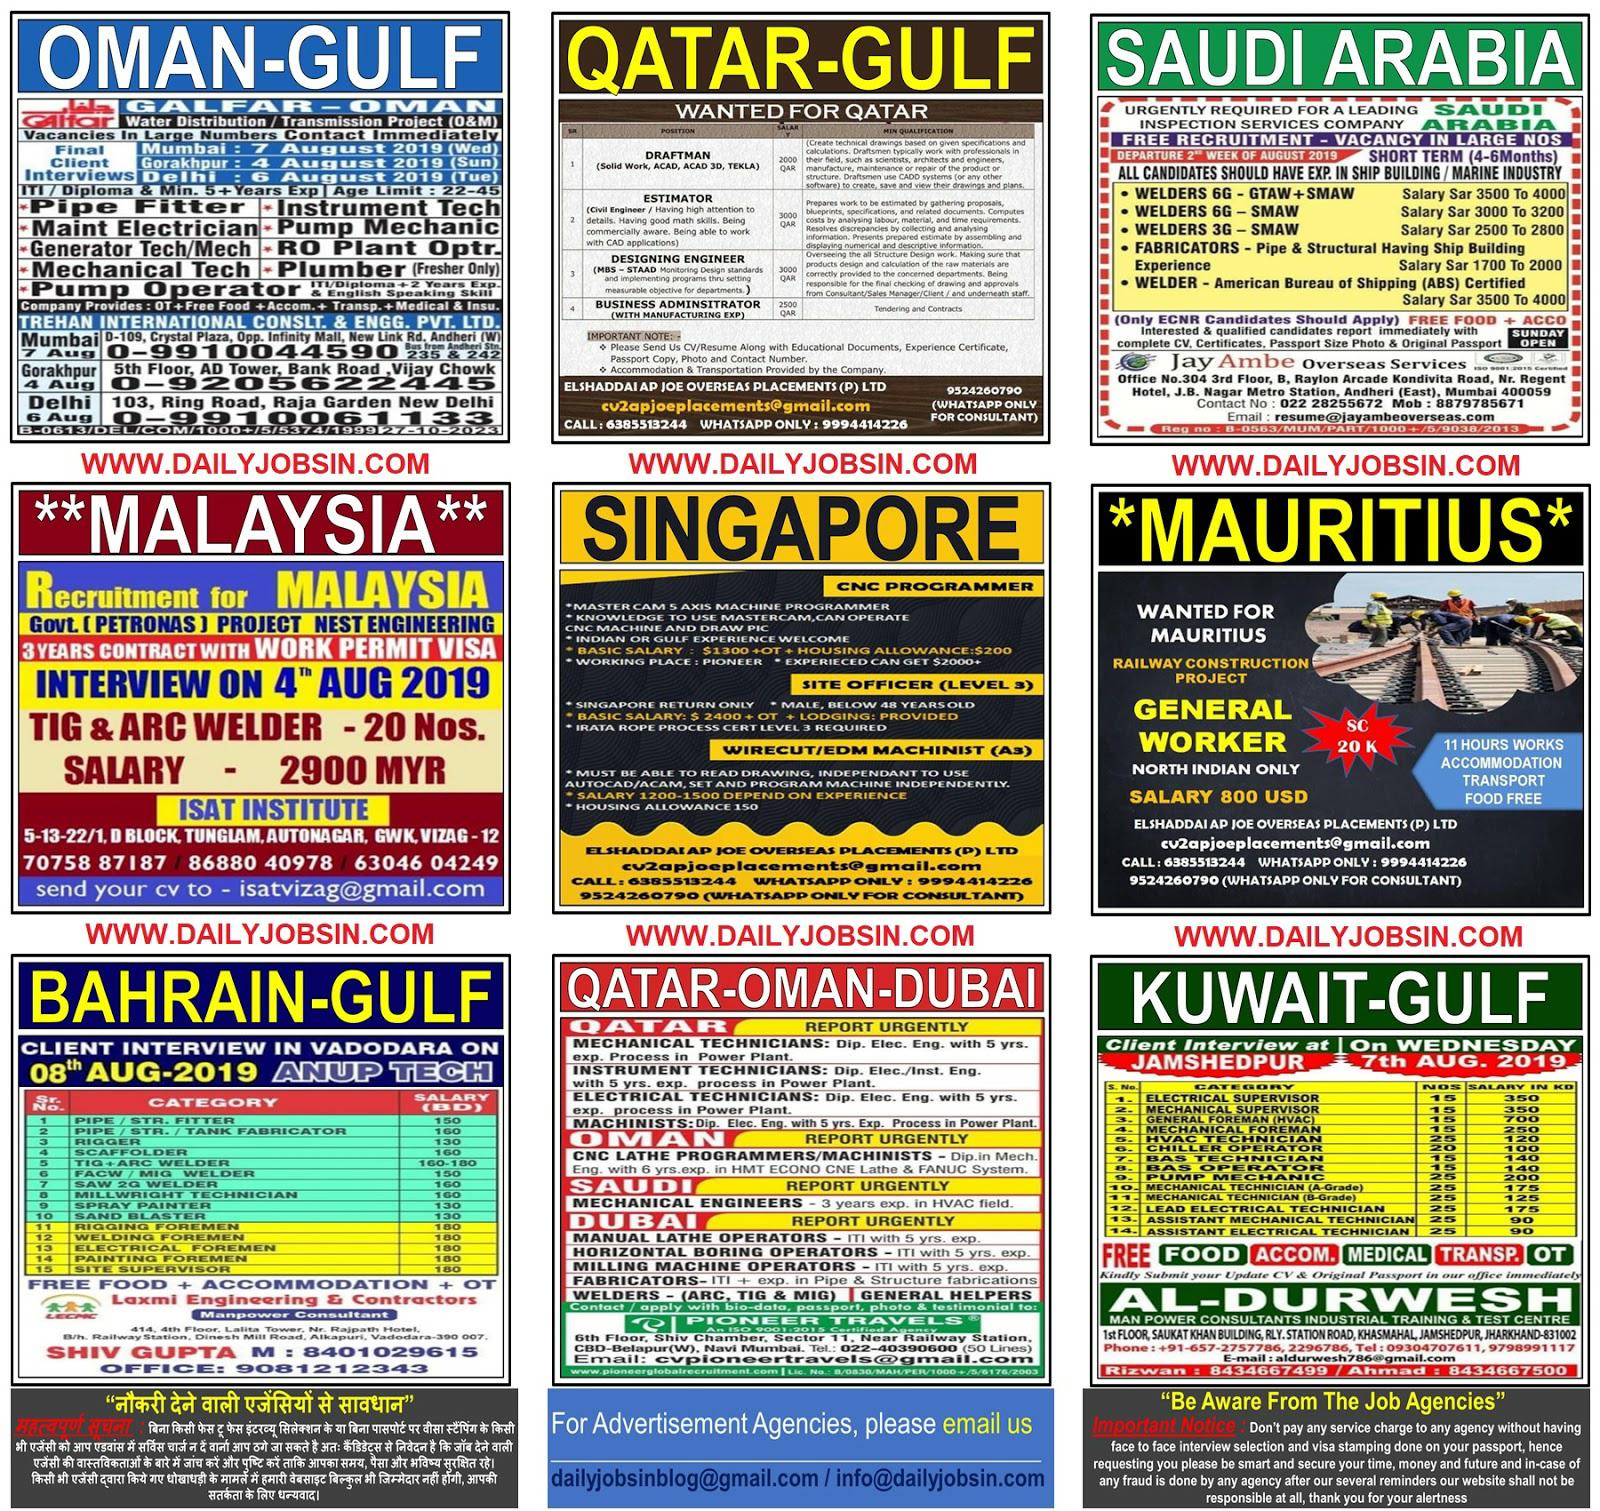 MANPOWER URGENT REQUIREMENT FOR POLAND, MALAYSIA, UK, SINGAPORE, MALDIVES, BAHRAIN, IRAQ, SAUDI ARABIA, QATAR, KUWAIT, OMAN, DUBAI-UAE & INDIA